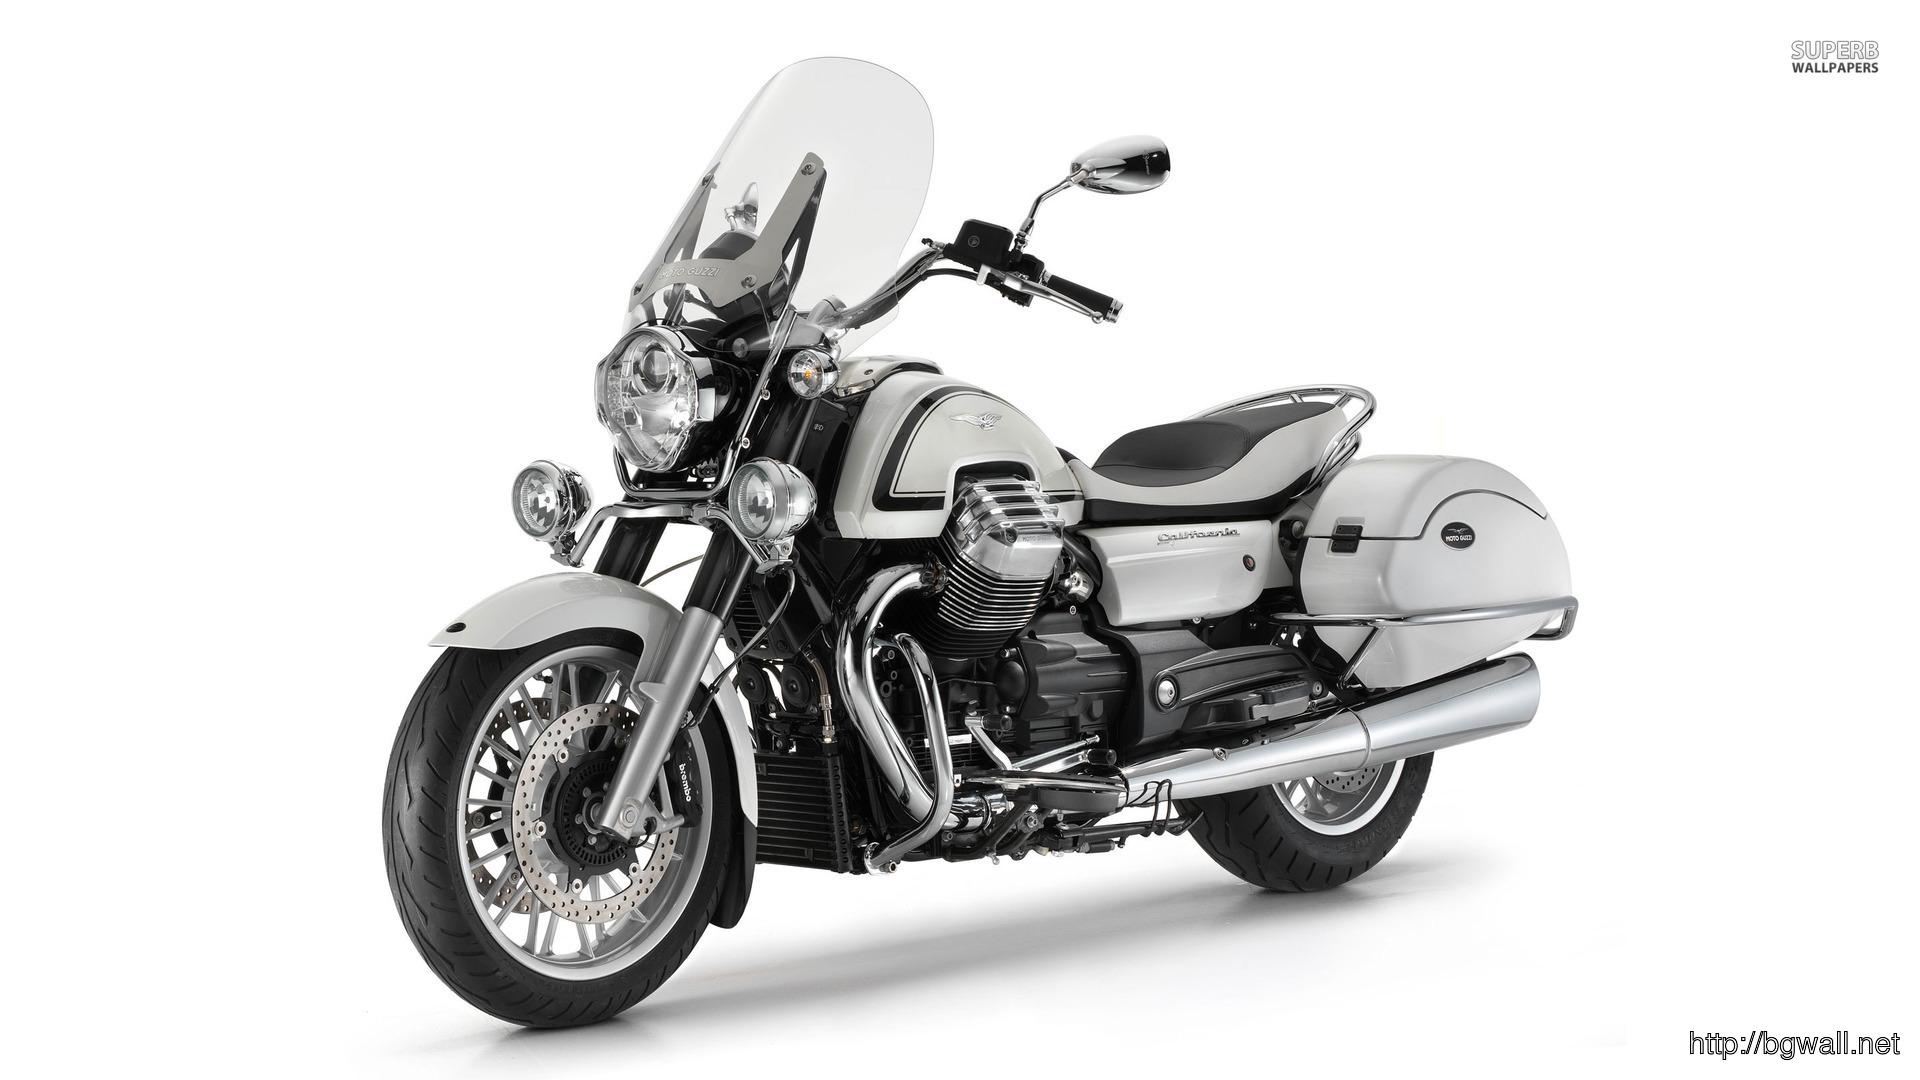 2013 Moto Guzzi California Wallpaper